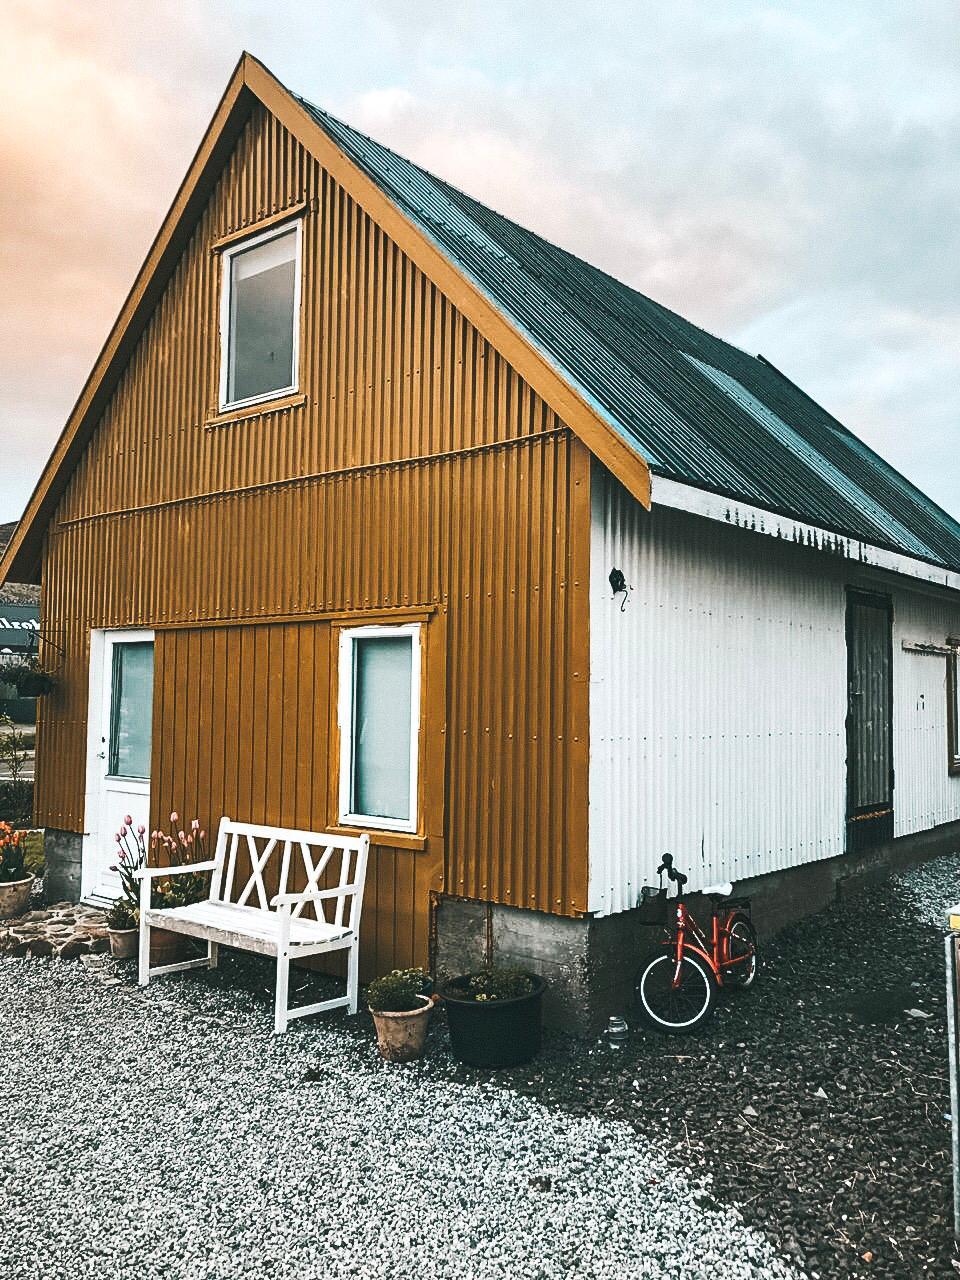 Casa em Faroe Islands (Foto: Trip To Follow)